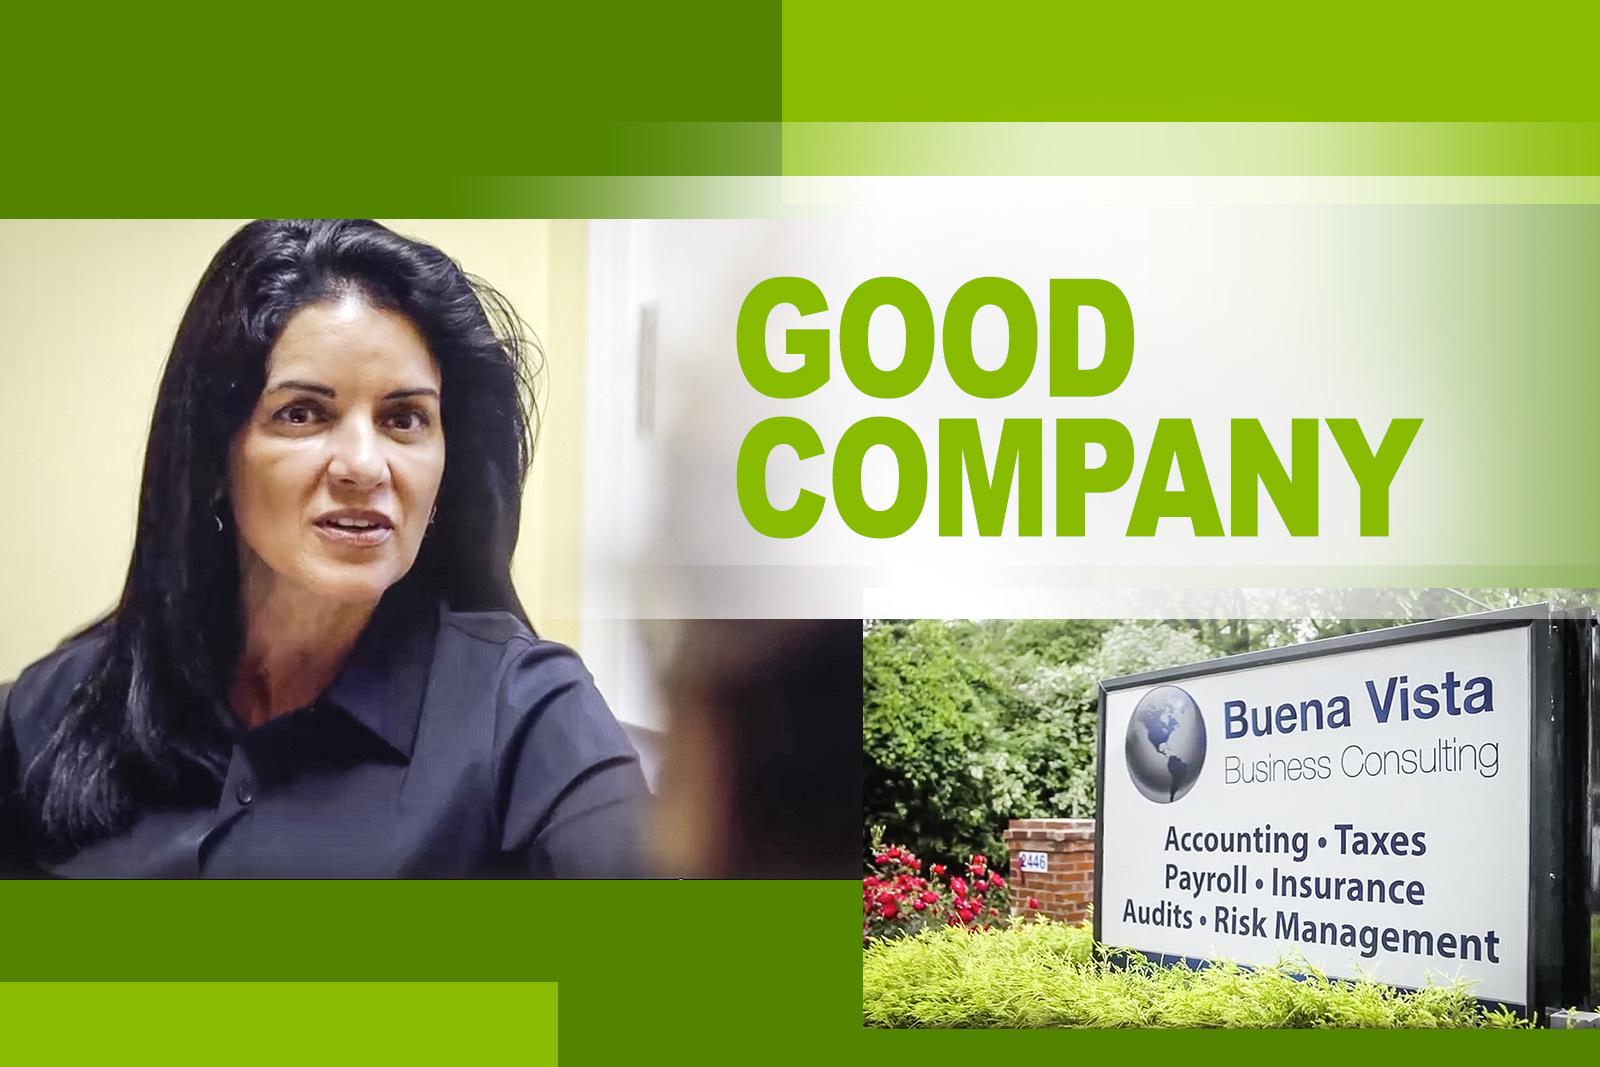 Good Company - Buena Vista Consulting